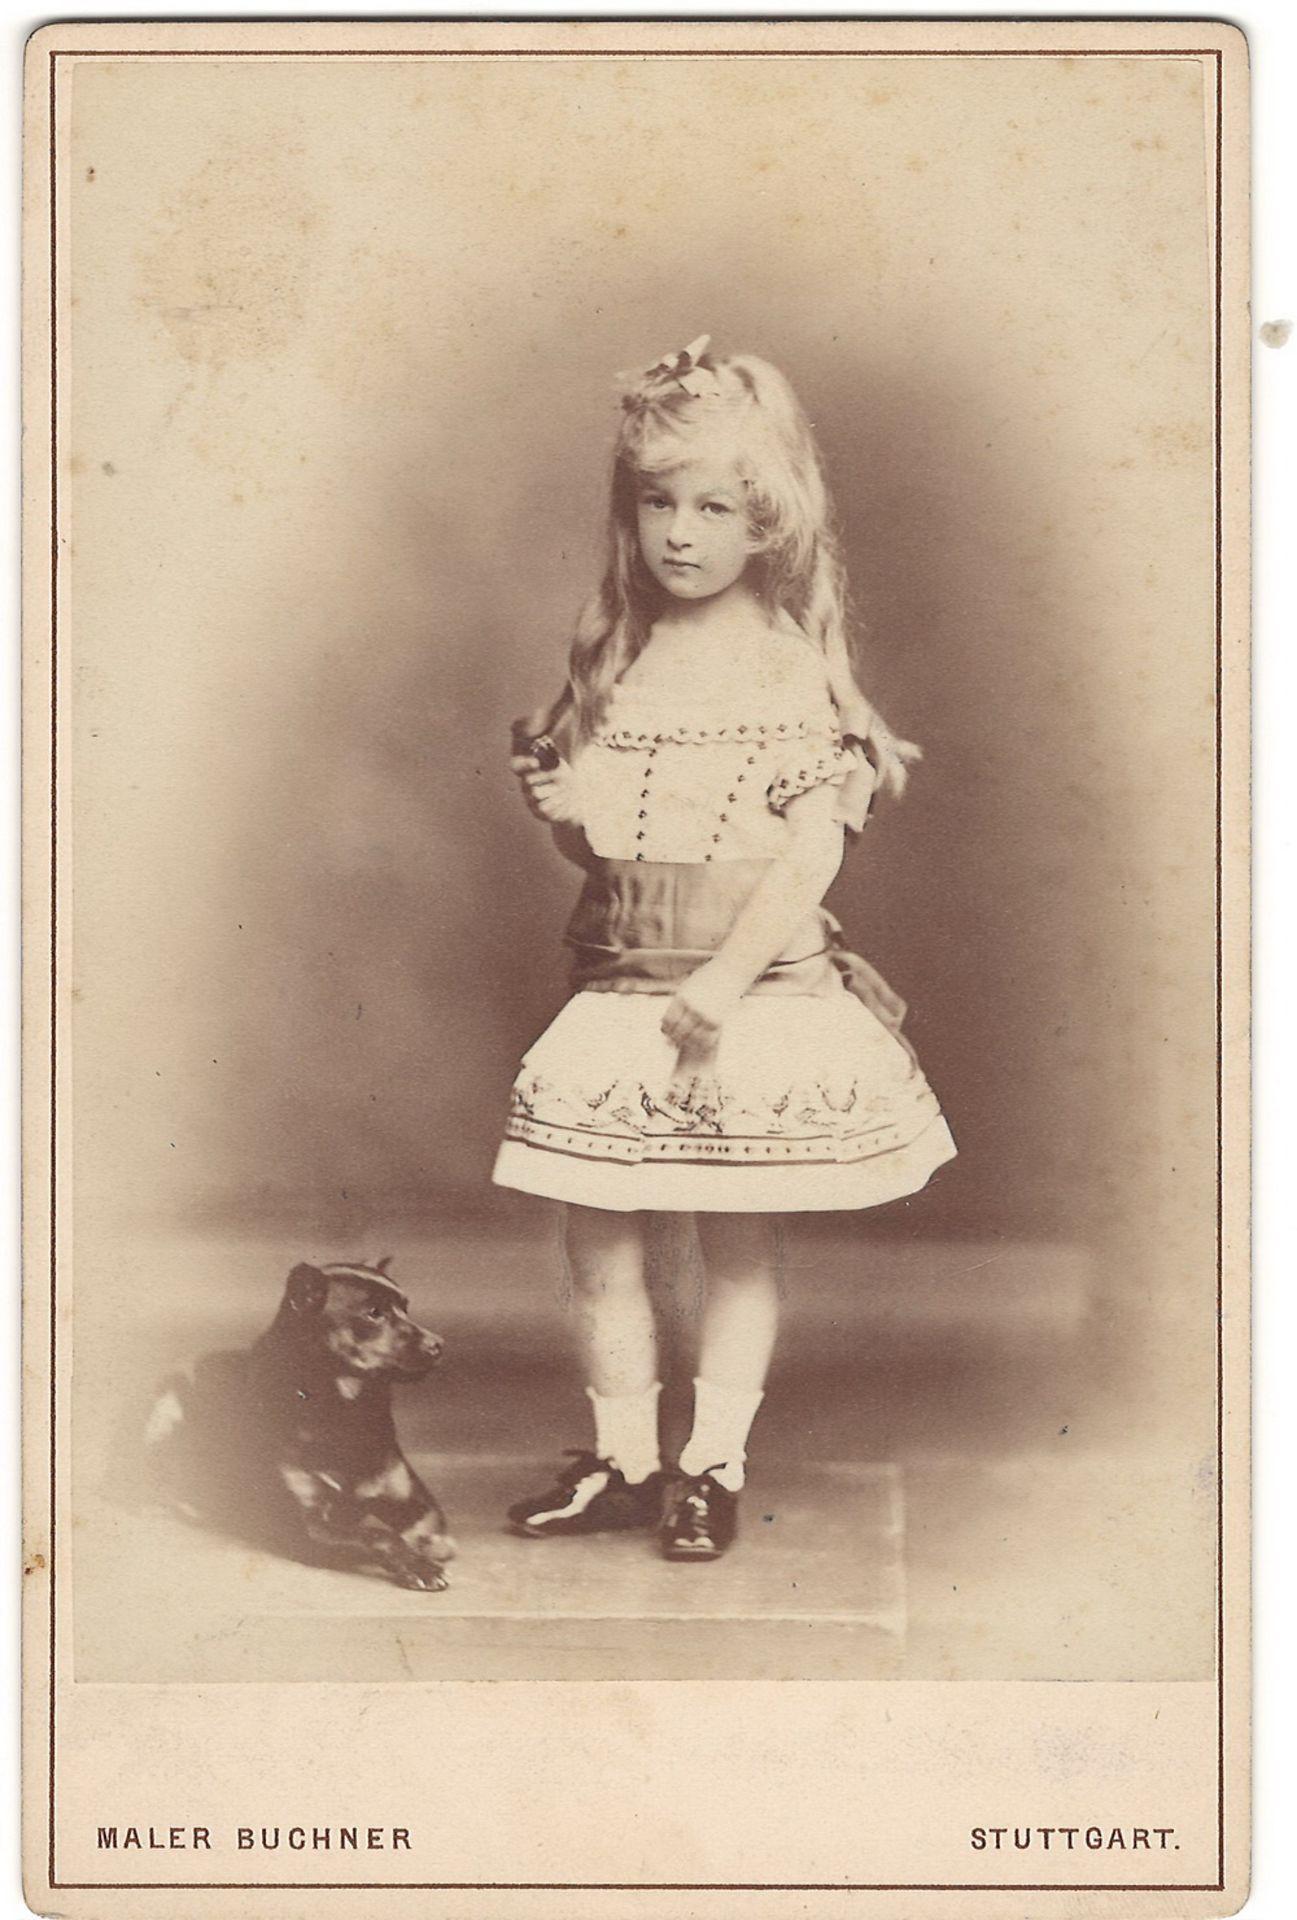 Buchner, M. Cabinet portrait of baroness Teresa Riderer-Taufkirkсner. Photograph. Author's print. [1